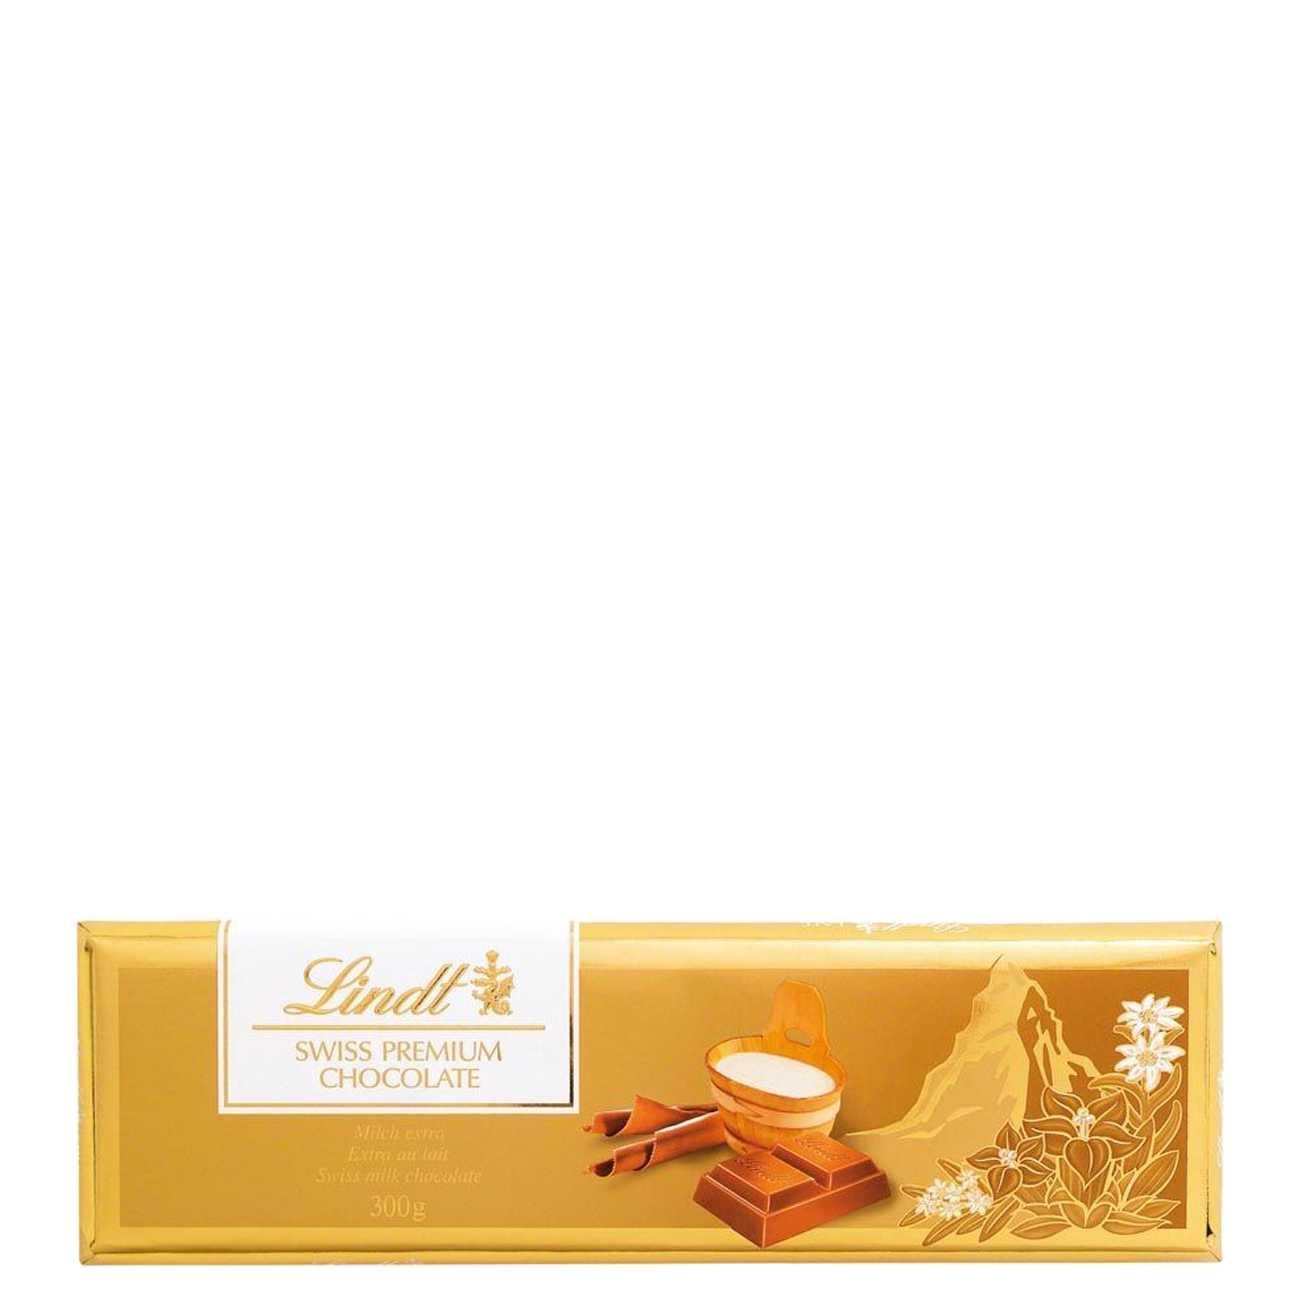 GOLD MILK CHOCOLATE 300 G